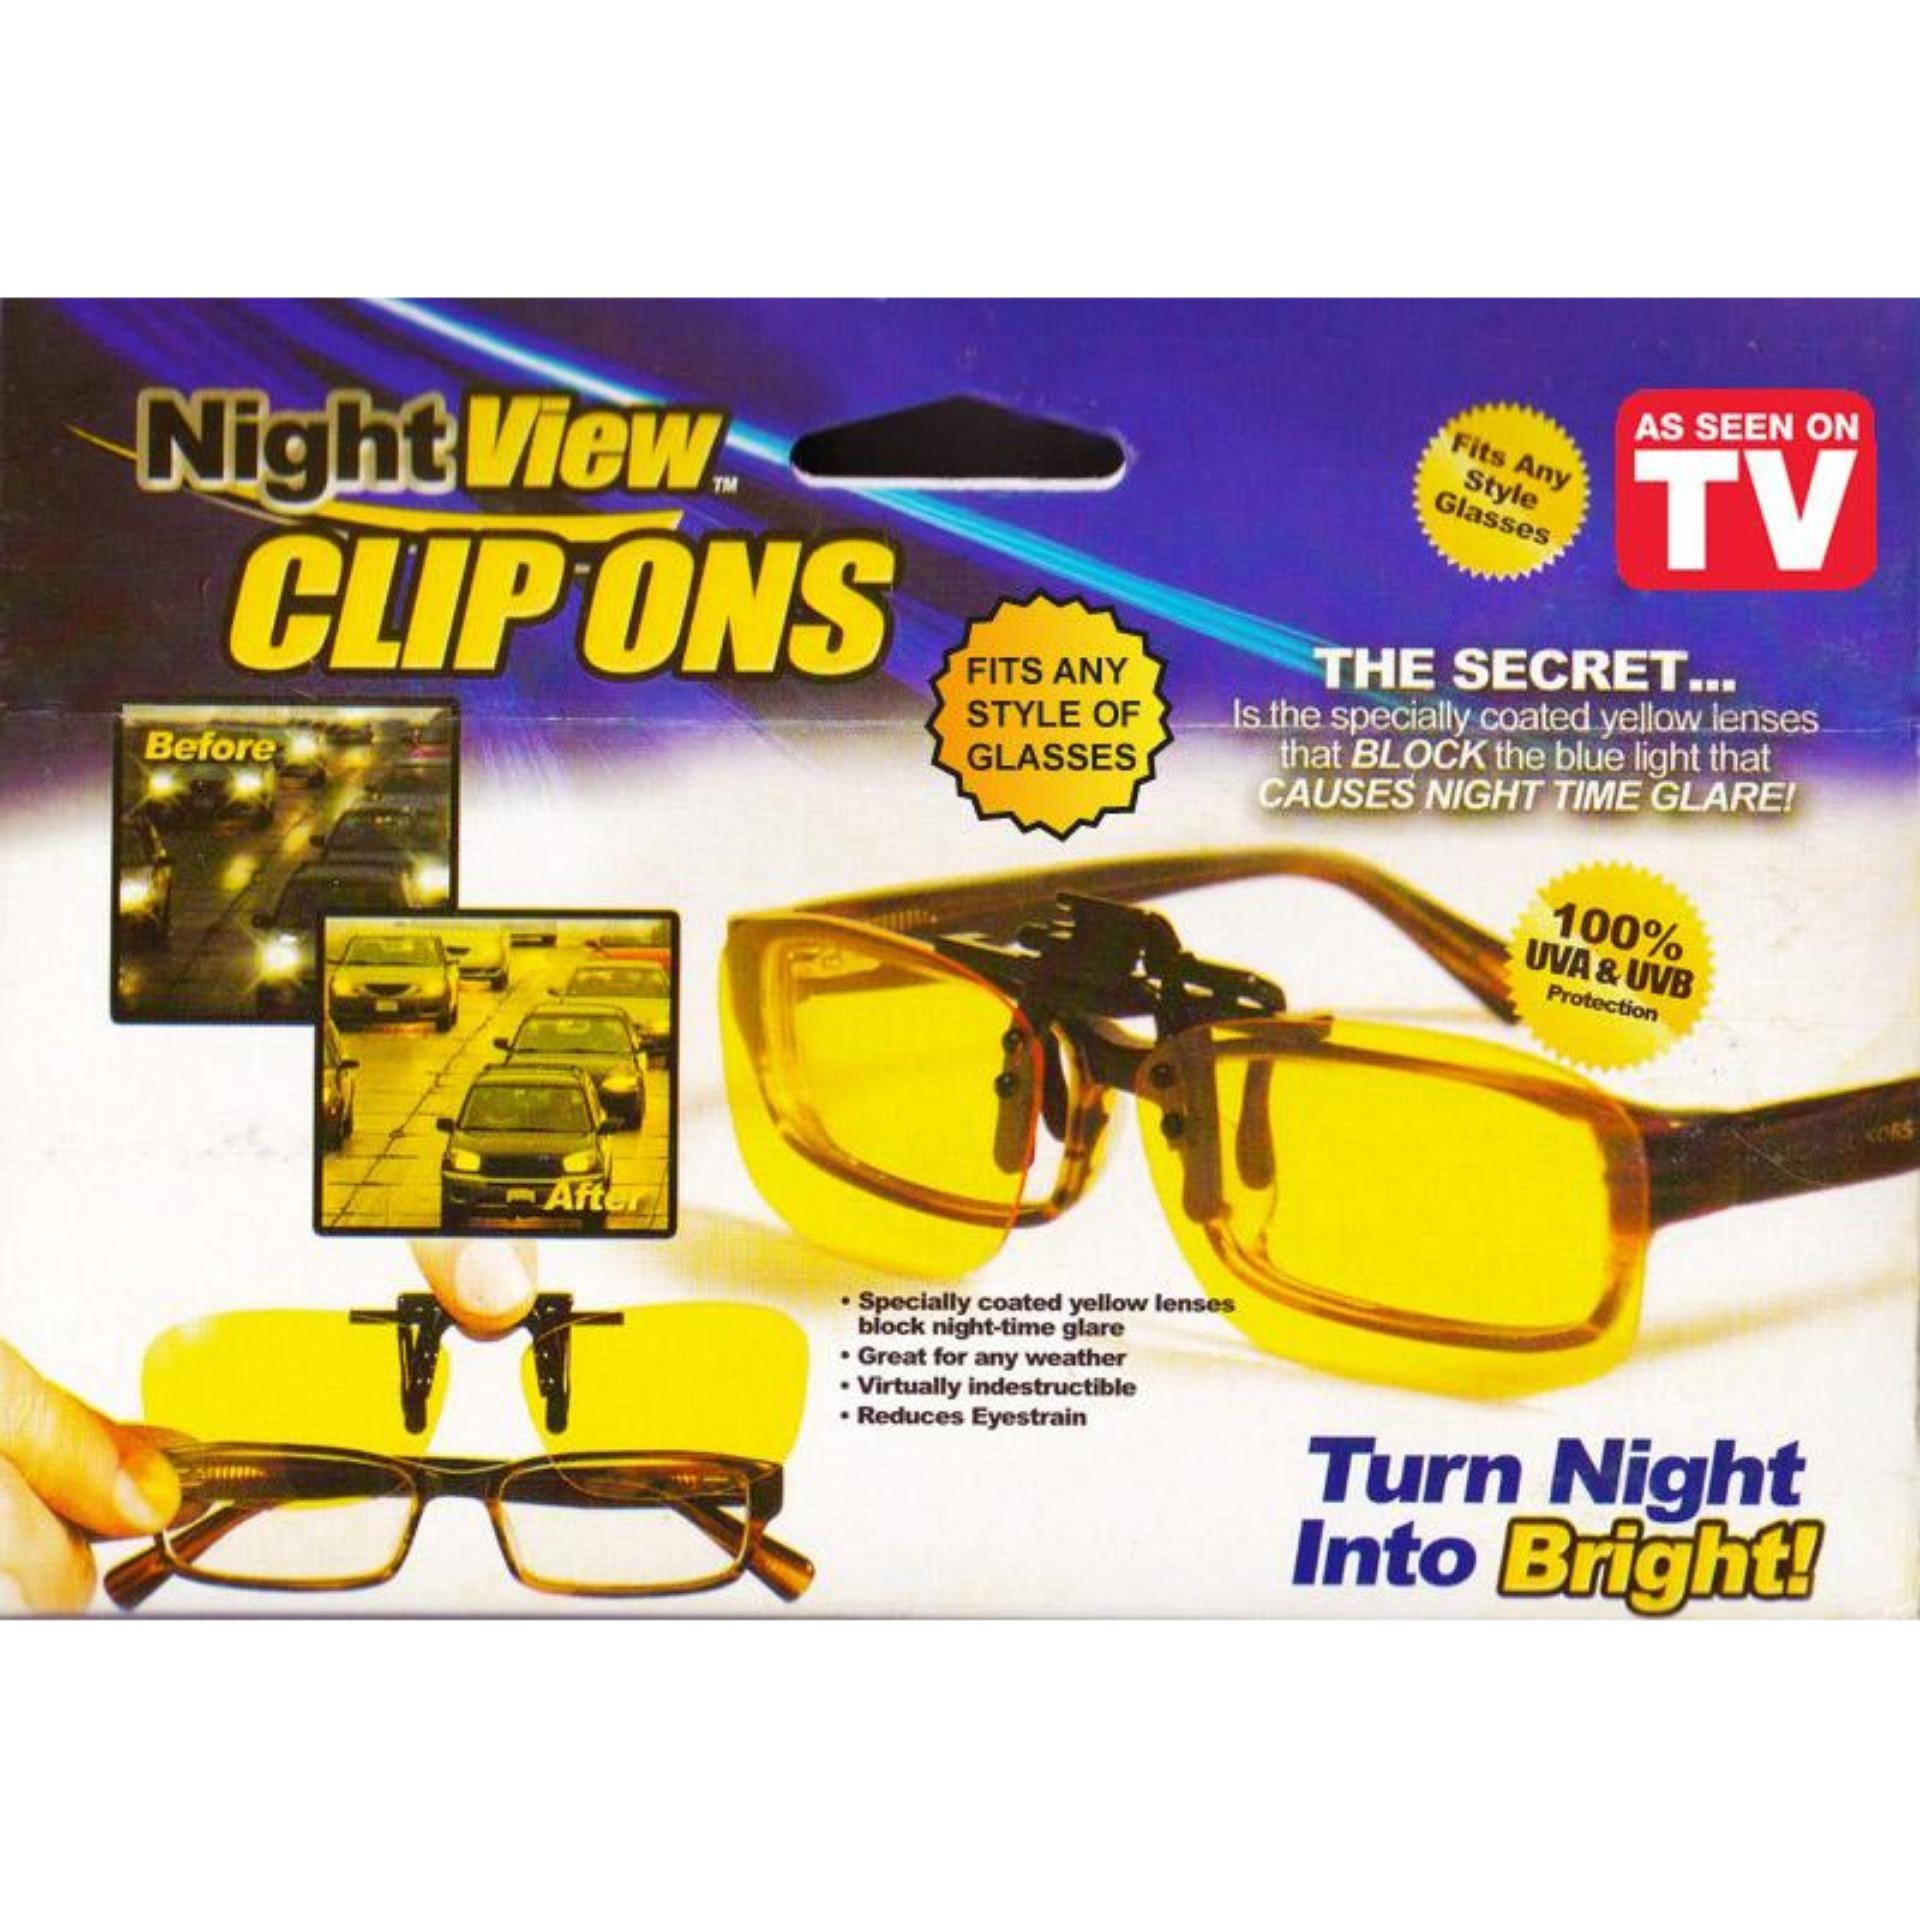 Daftar Harga Night View Clip Ons As Seen On Tv Kacamata Jepit Anti Lensa Silau Lensajepit